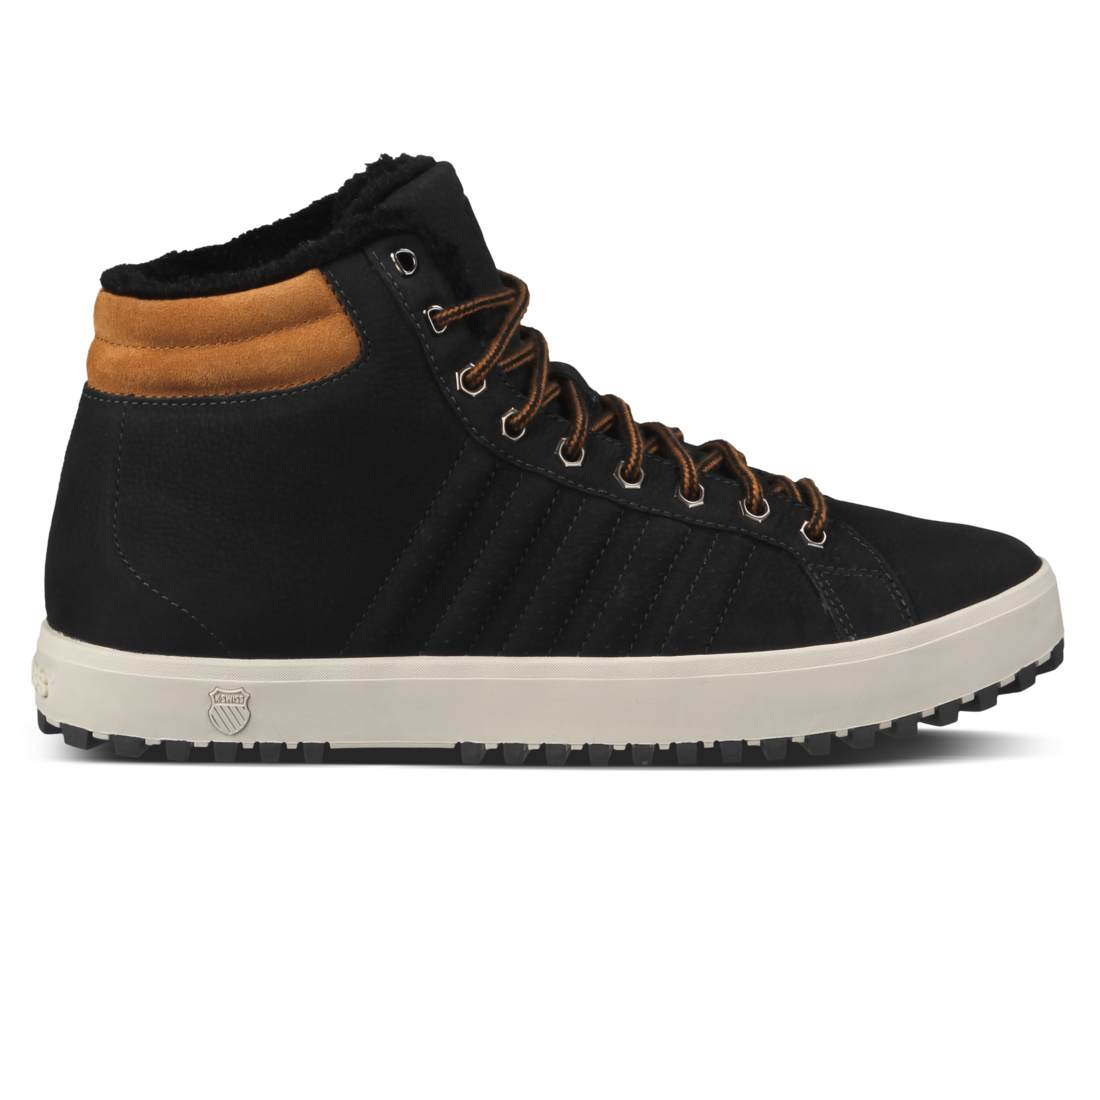 k swiss adcourt 39 72 boot schuhe winterschuhe sneaker winter gef ttert herren 41 ebay. Black Bedroom Furniture Sets. Home Design Ideas